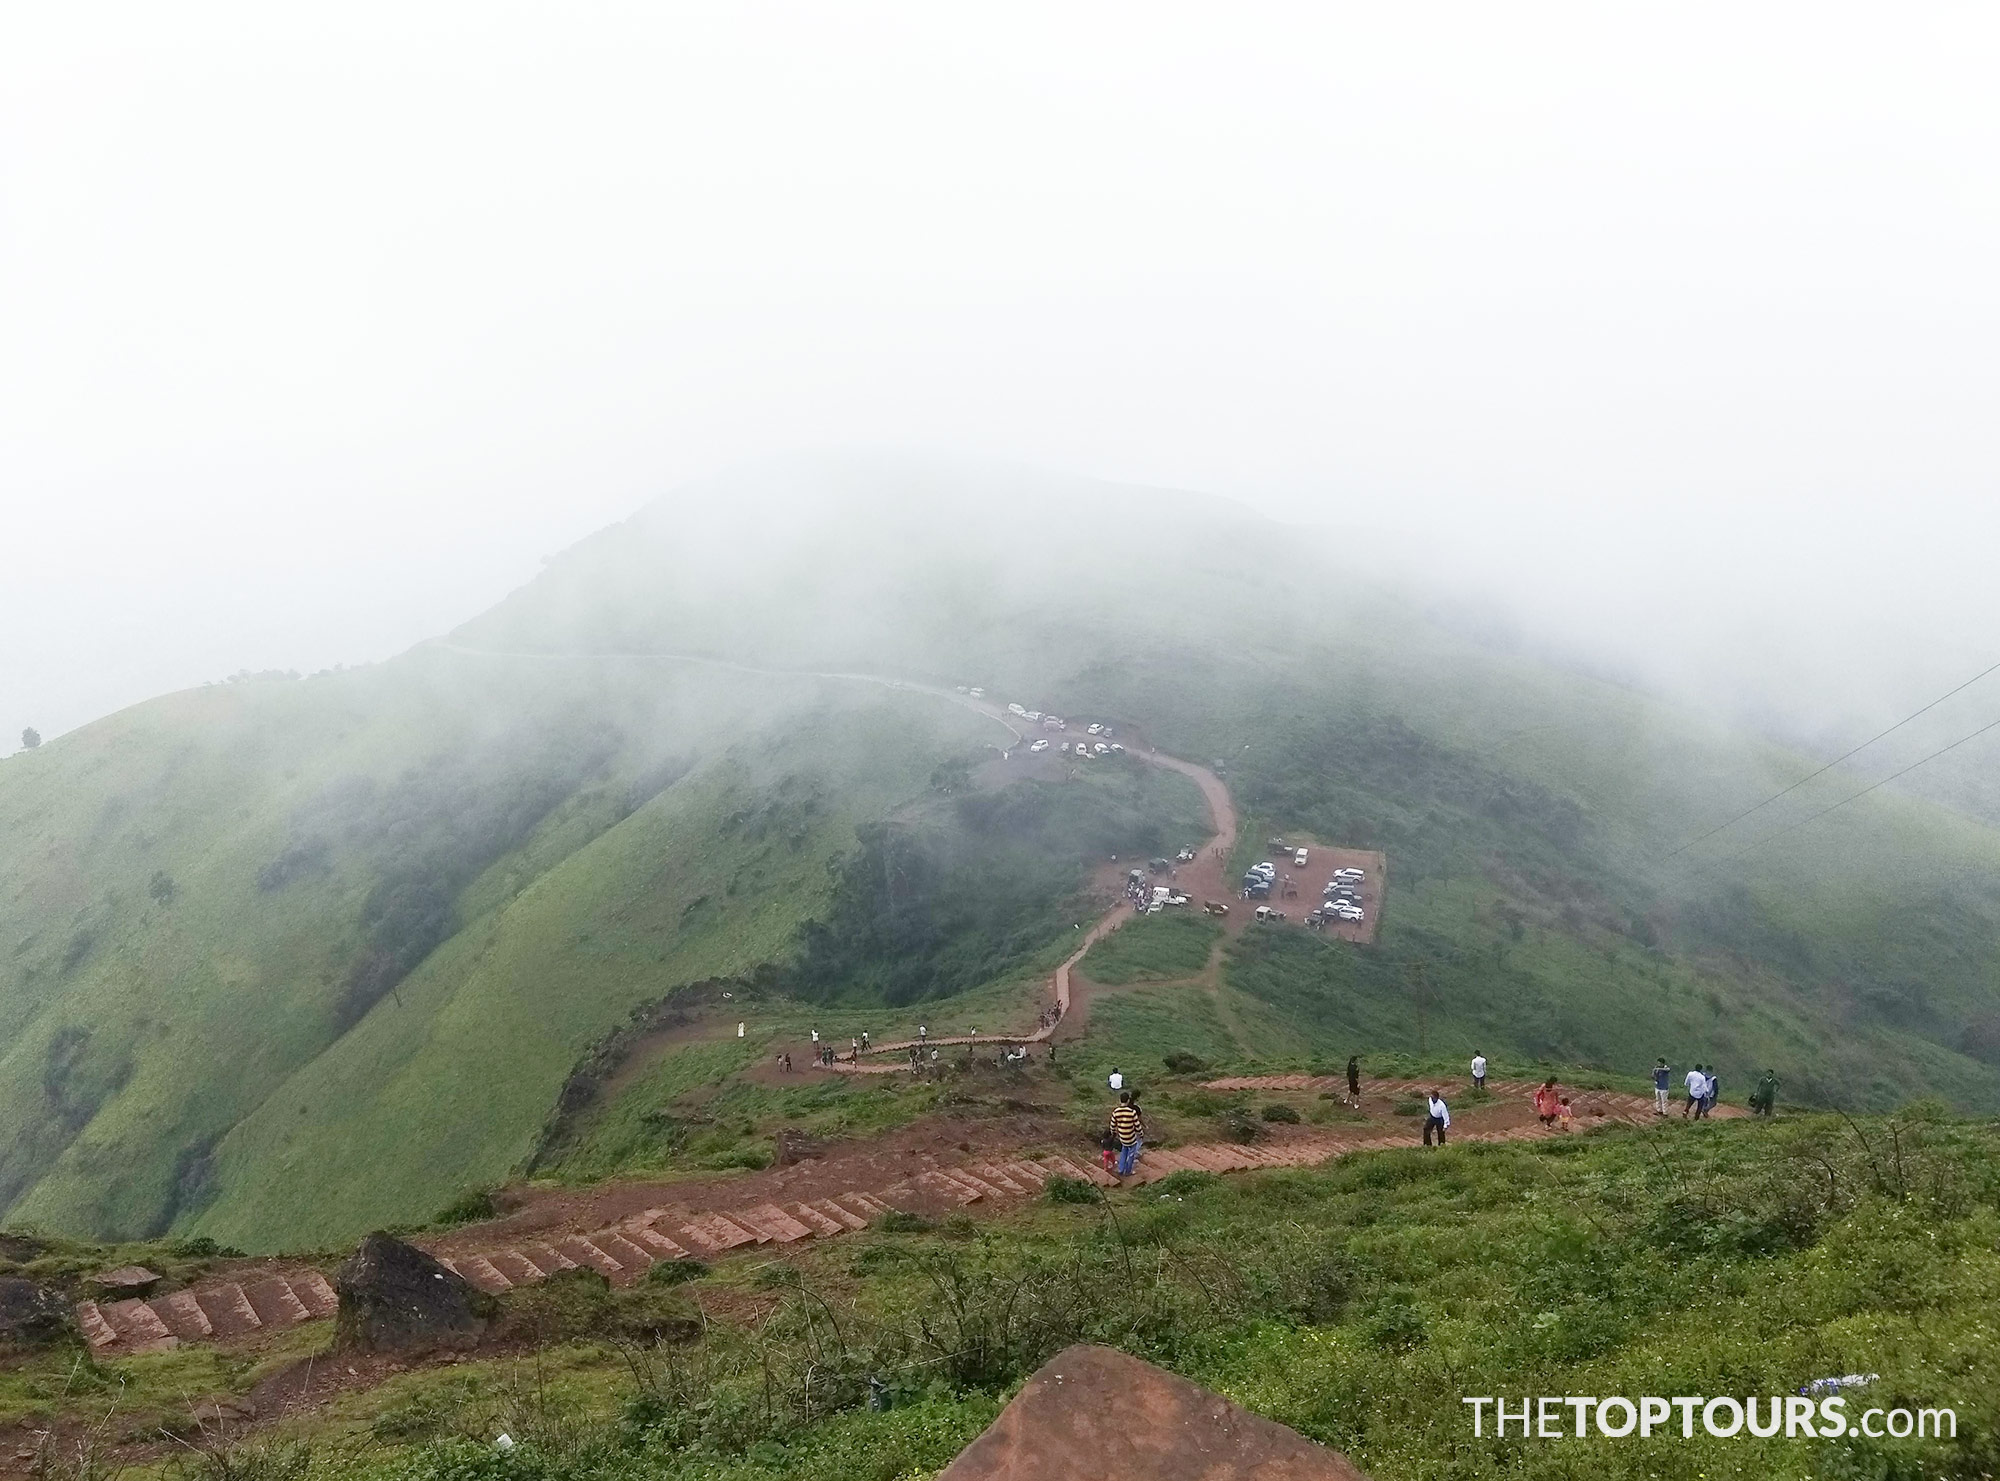 Tourists Attraction in Sakleshpur-Chikmagalur, Highest Peak Point in Karnataka